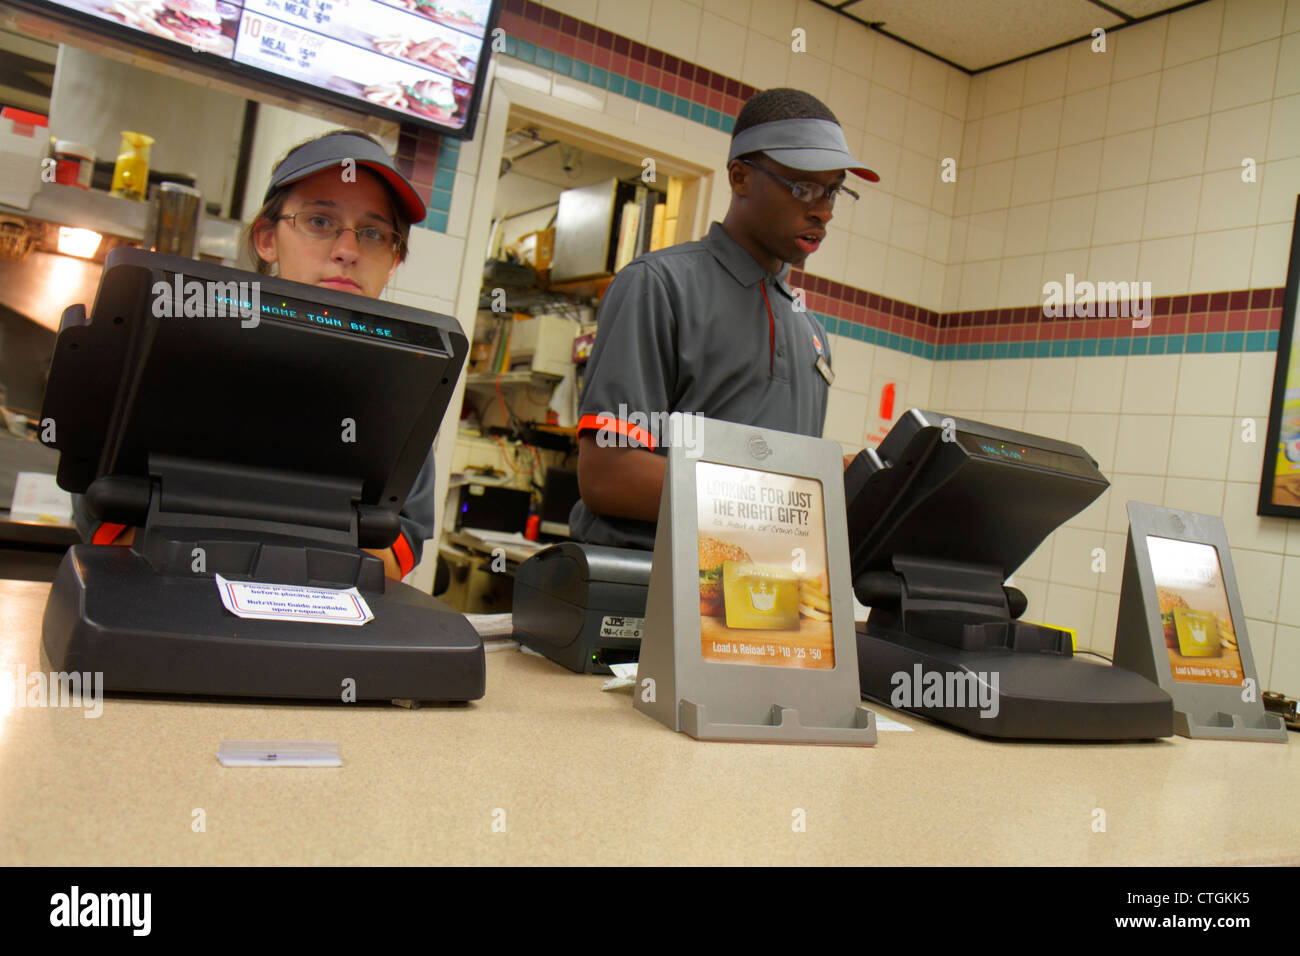 Port St. Lucie Florida restaurante de comida rápida Burger King cajero contador mujer hombre negro uniforme Imagen De Stock